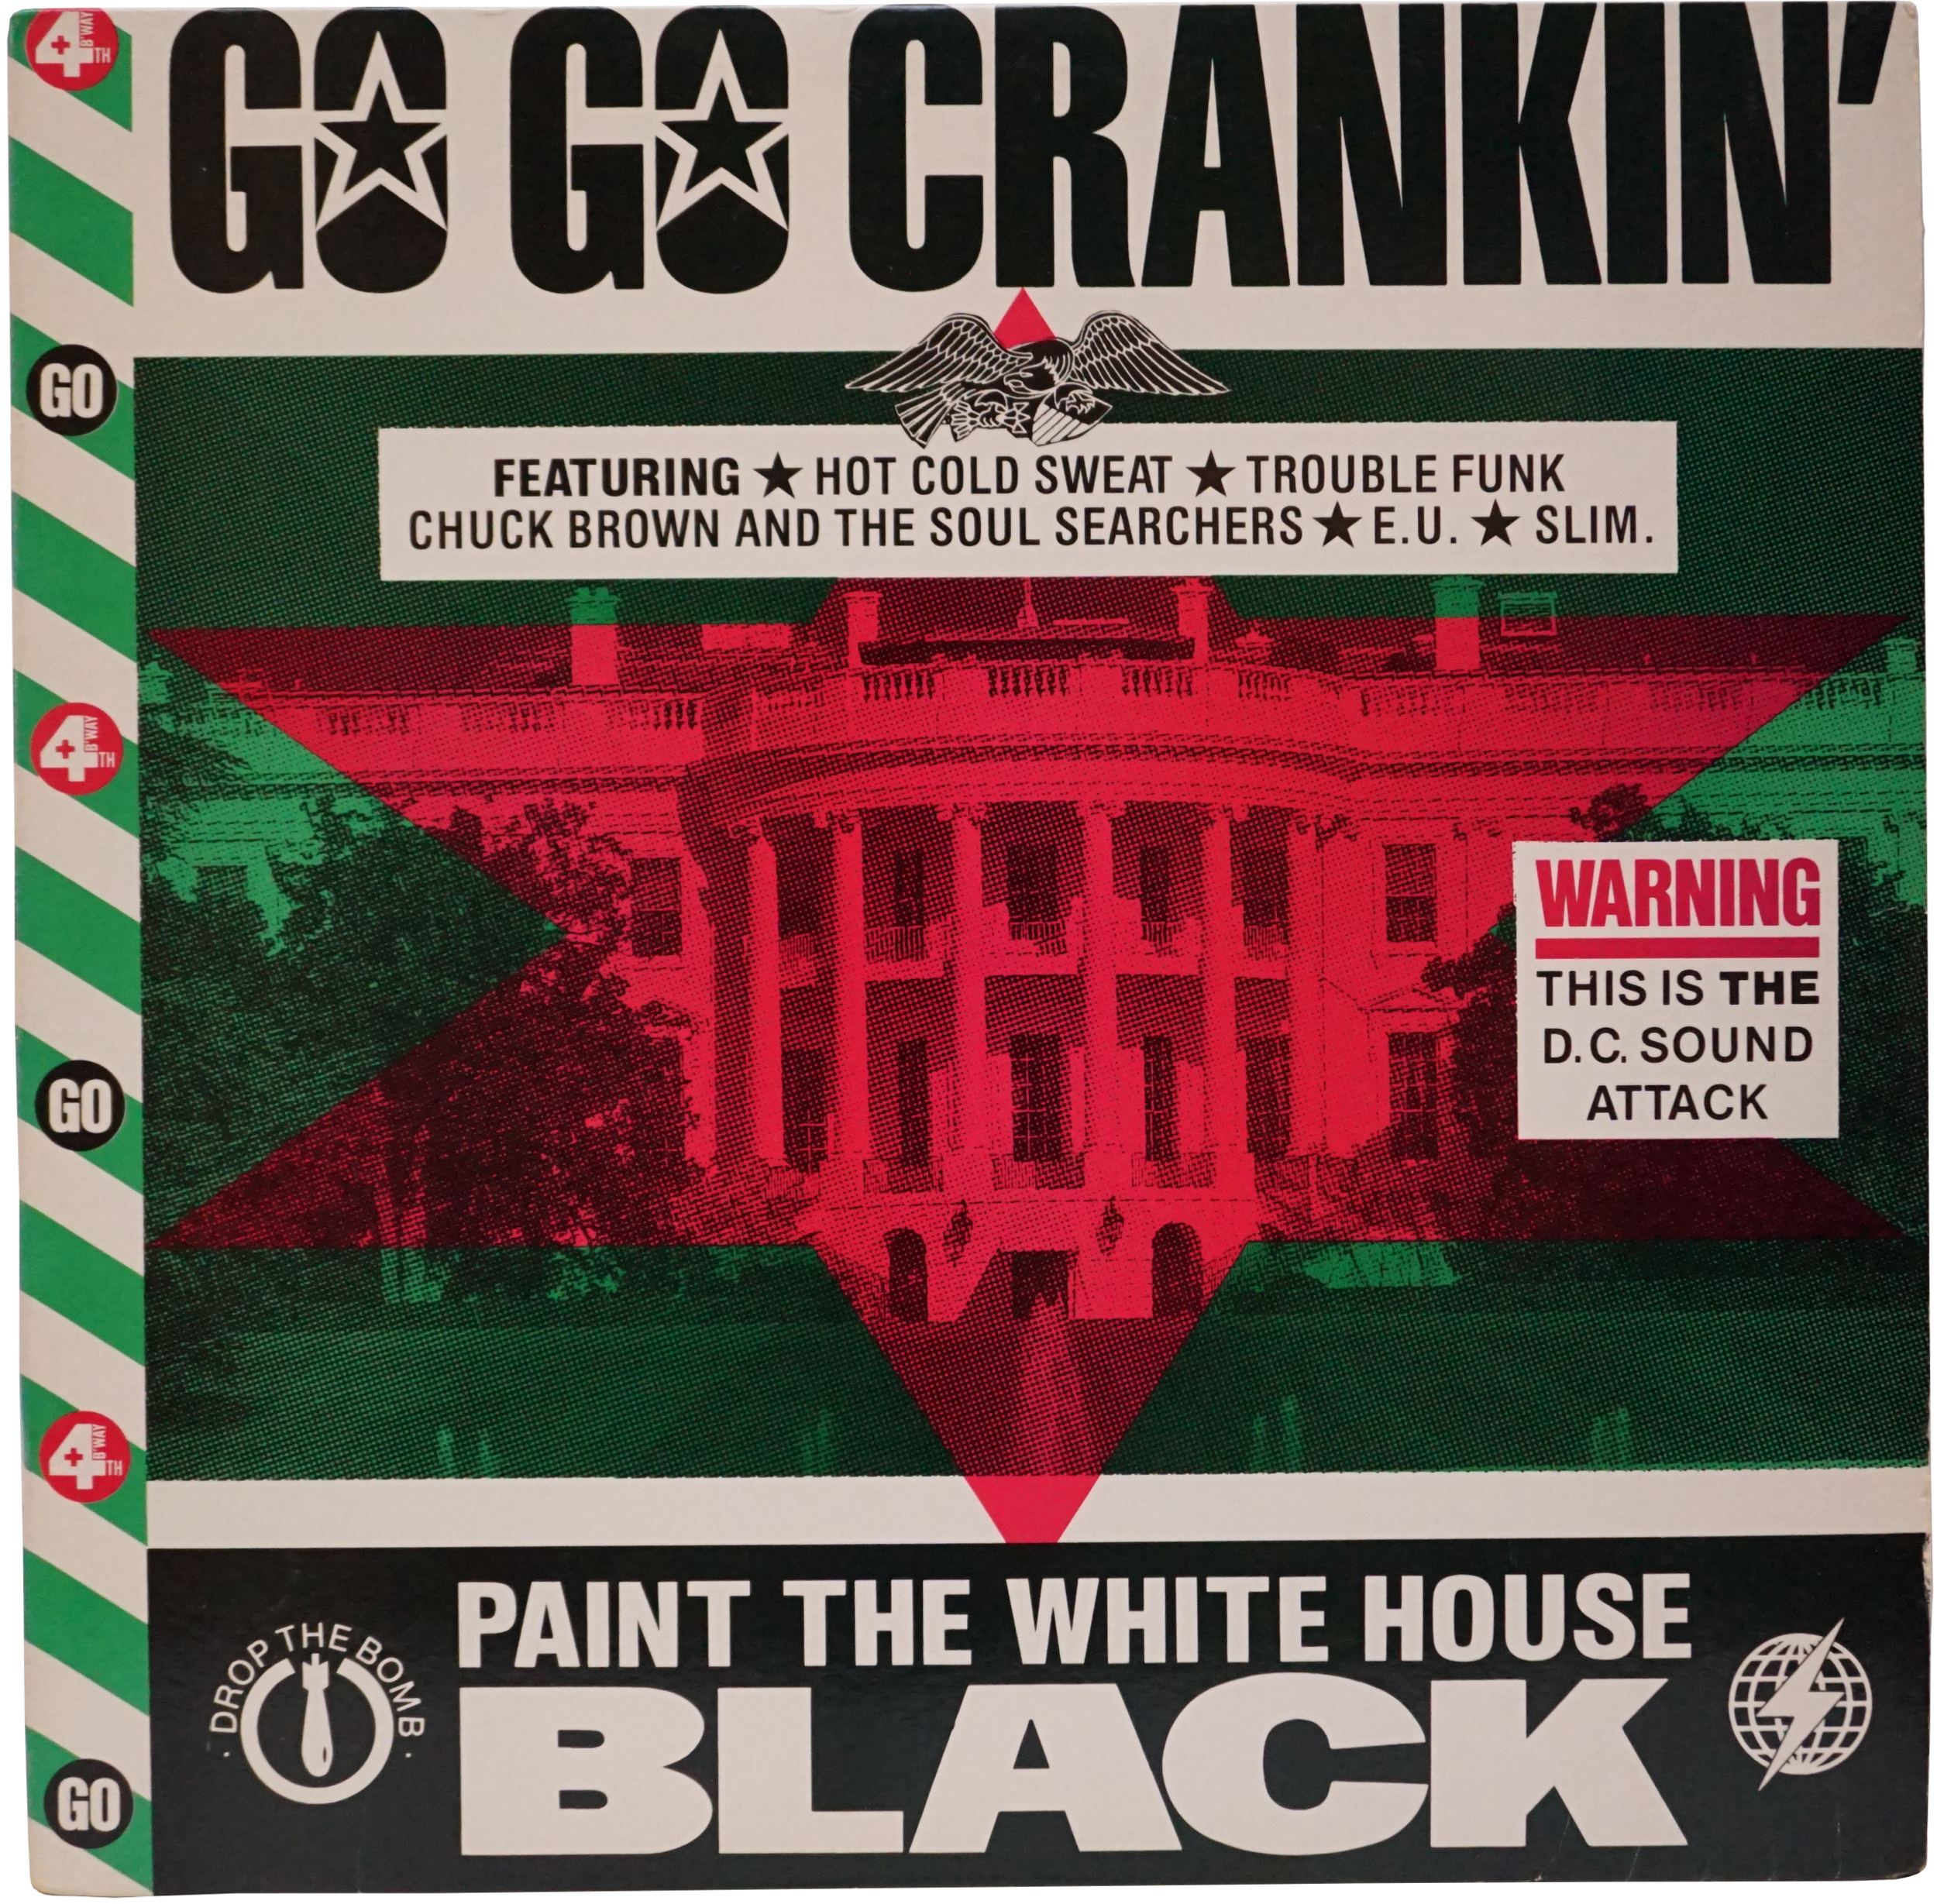 WLWLTDOO-1985-LP-GO_GO_CRANKIN-FRONT-BWAY4001.png